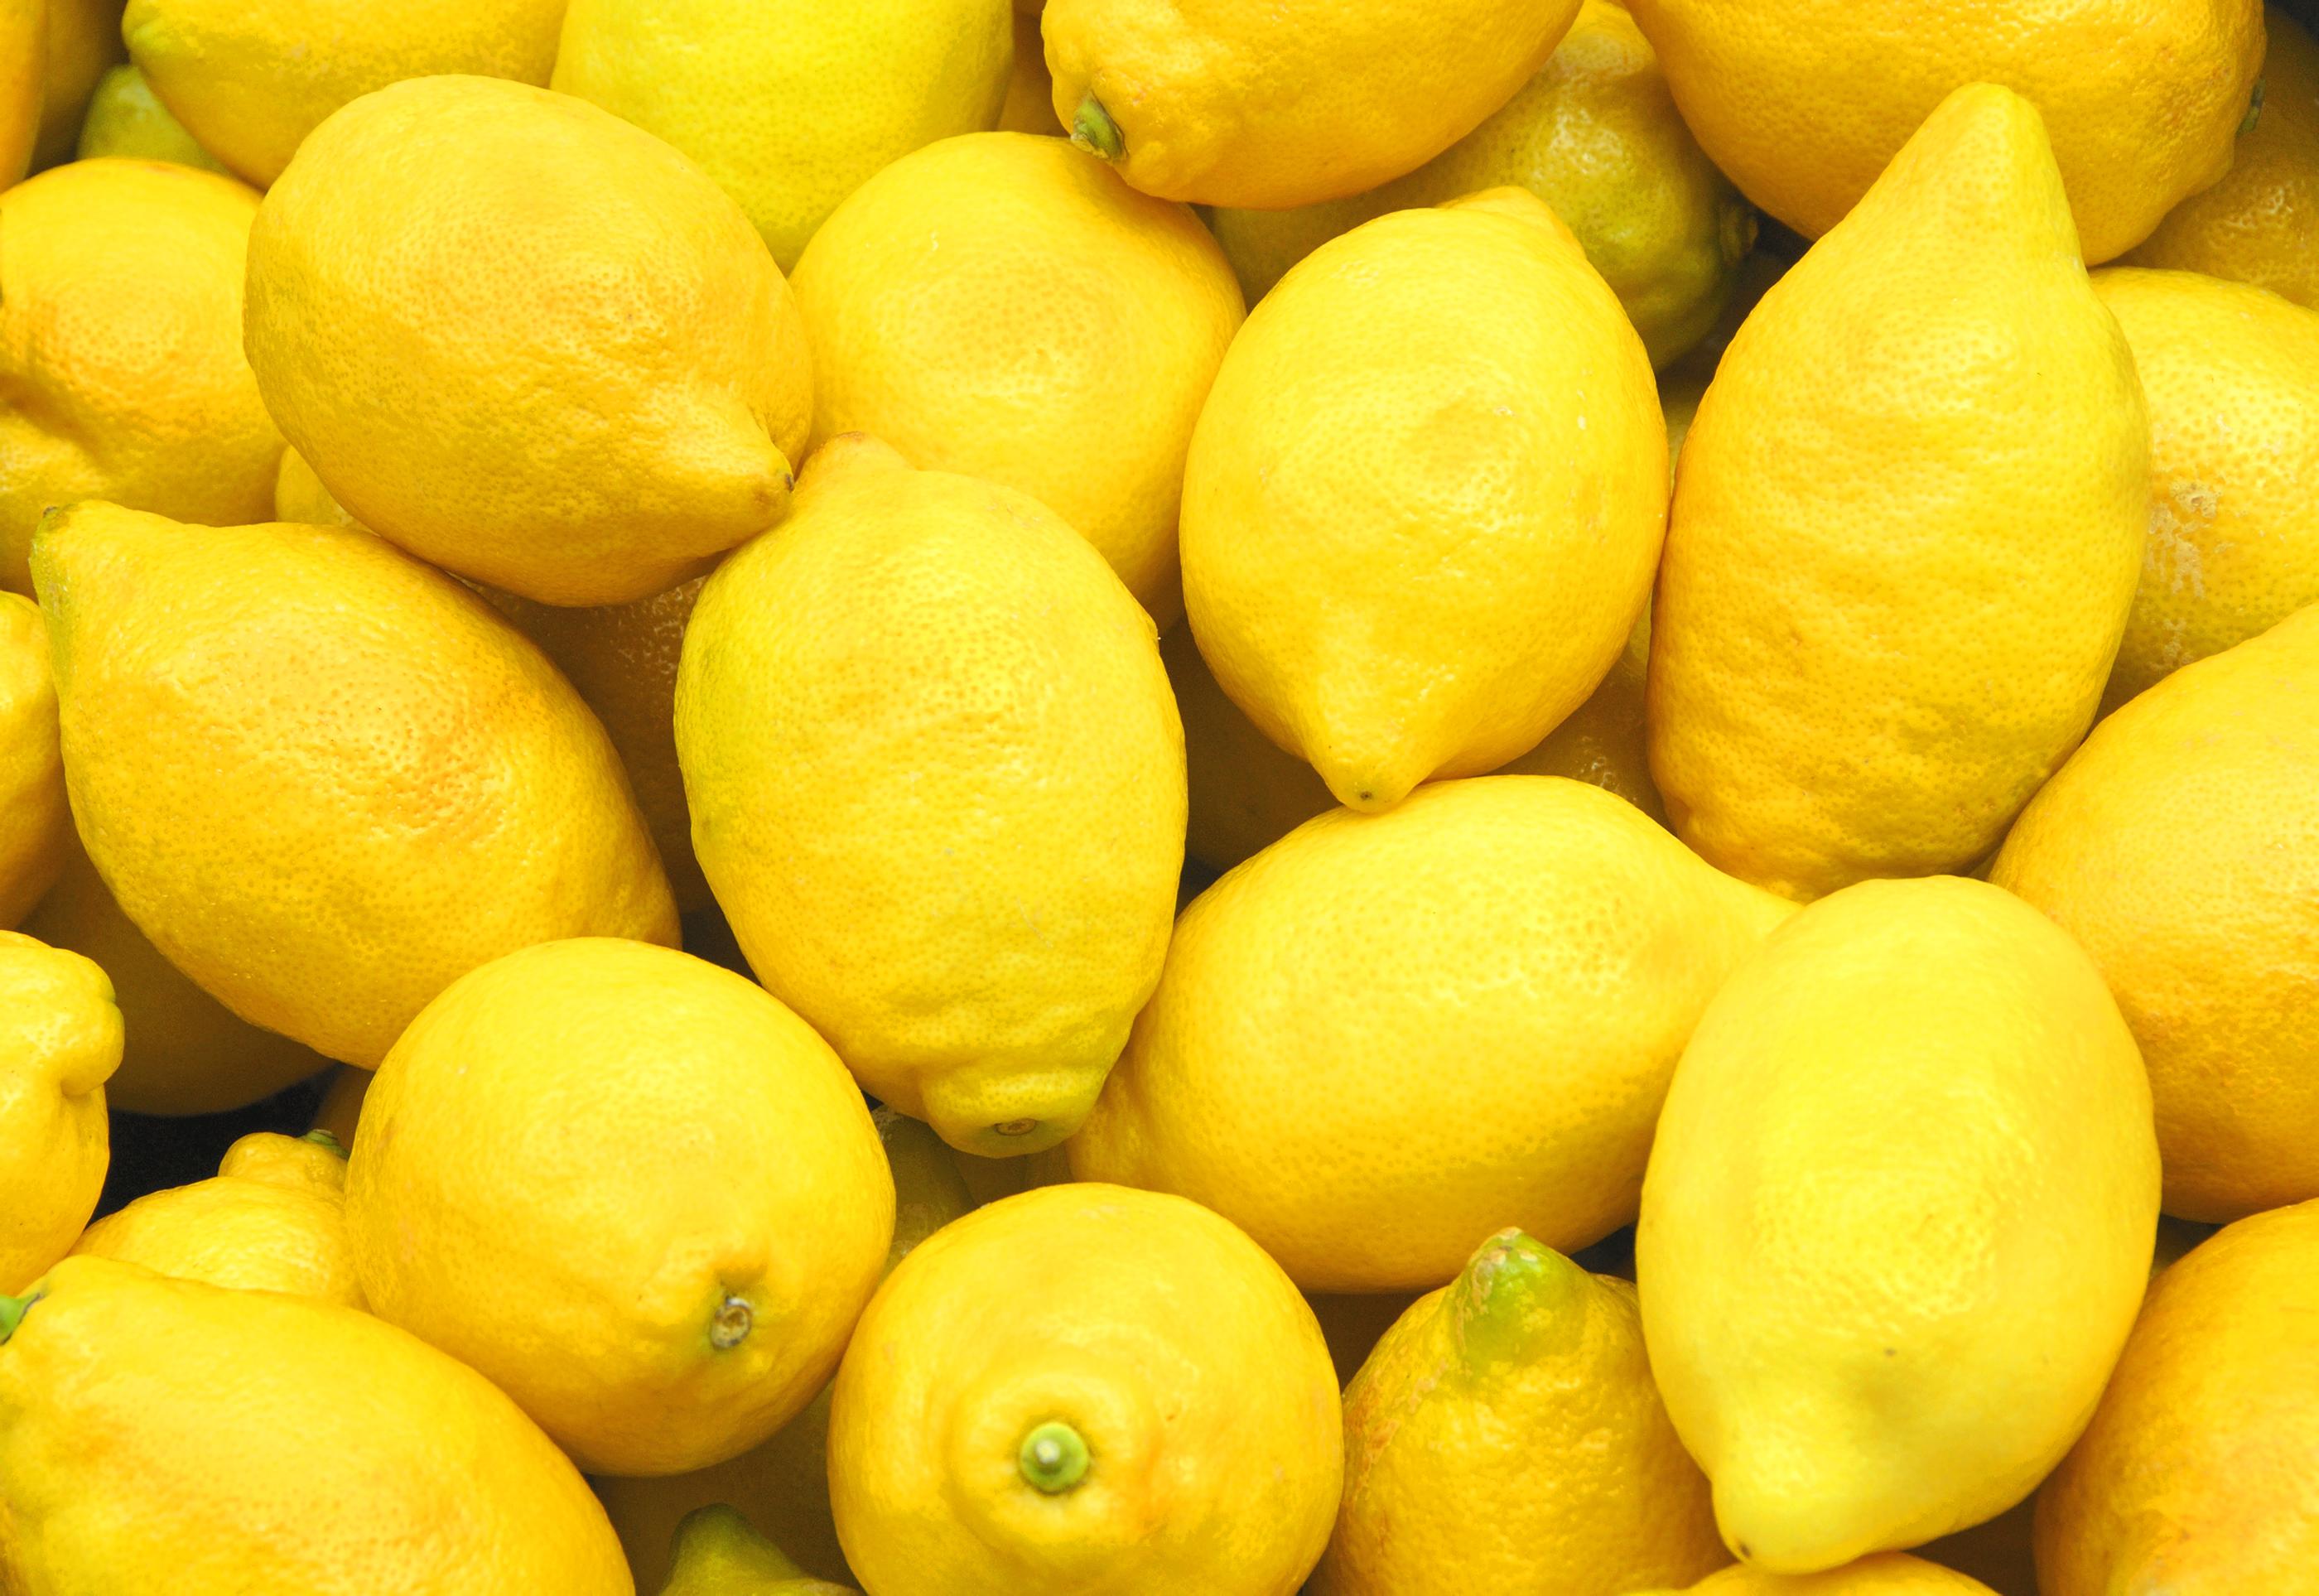 Free photo: Lemons background - Acid, Juice, Three - Free Download - Jooinn